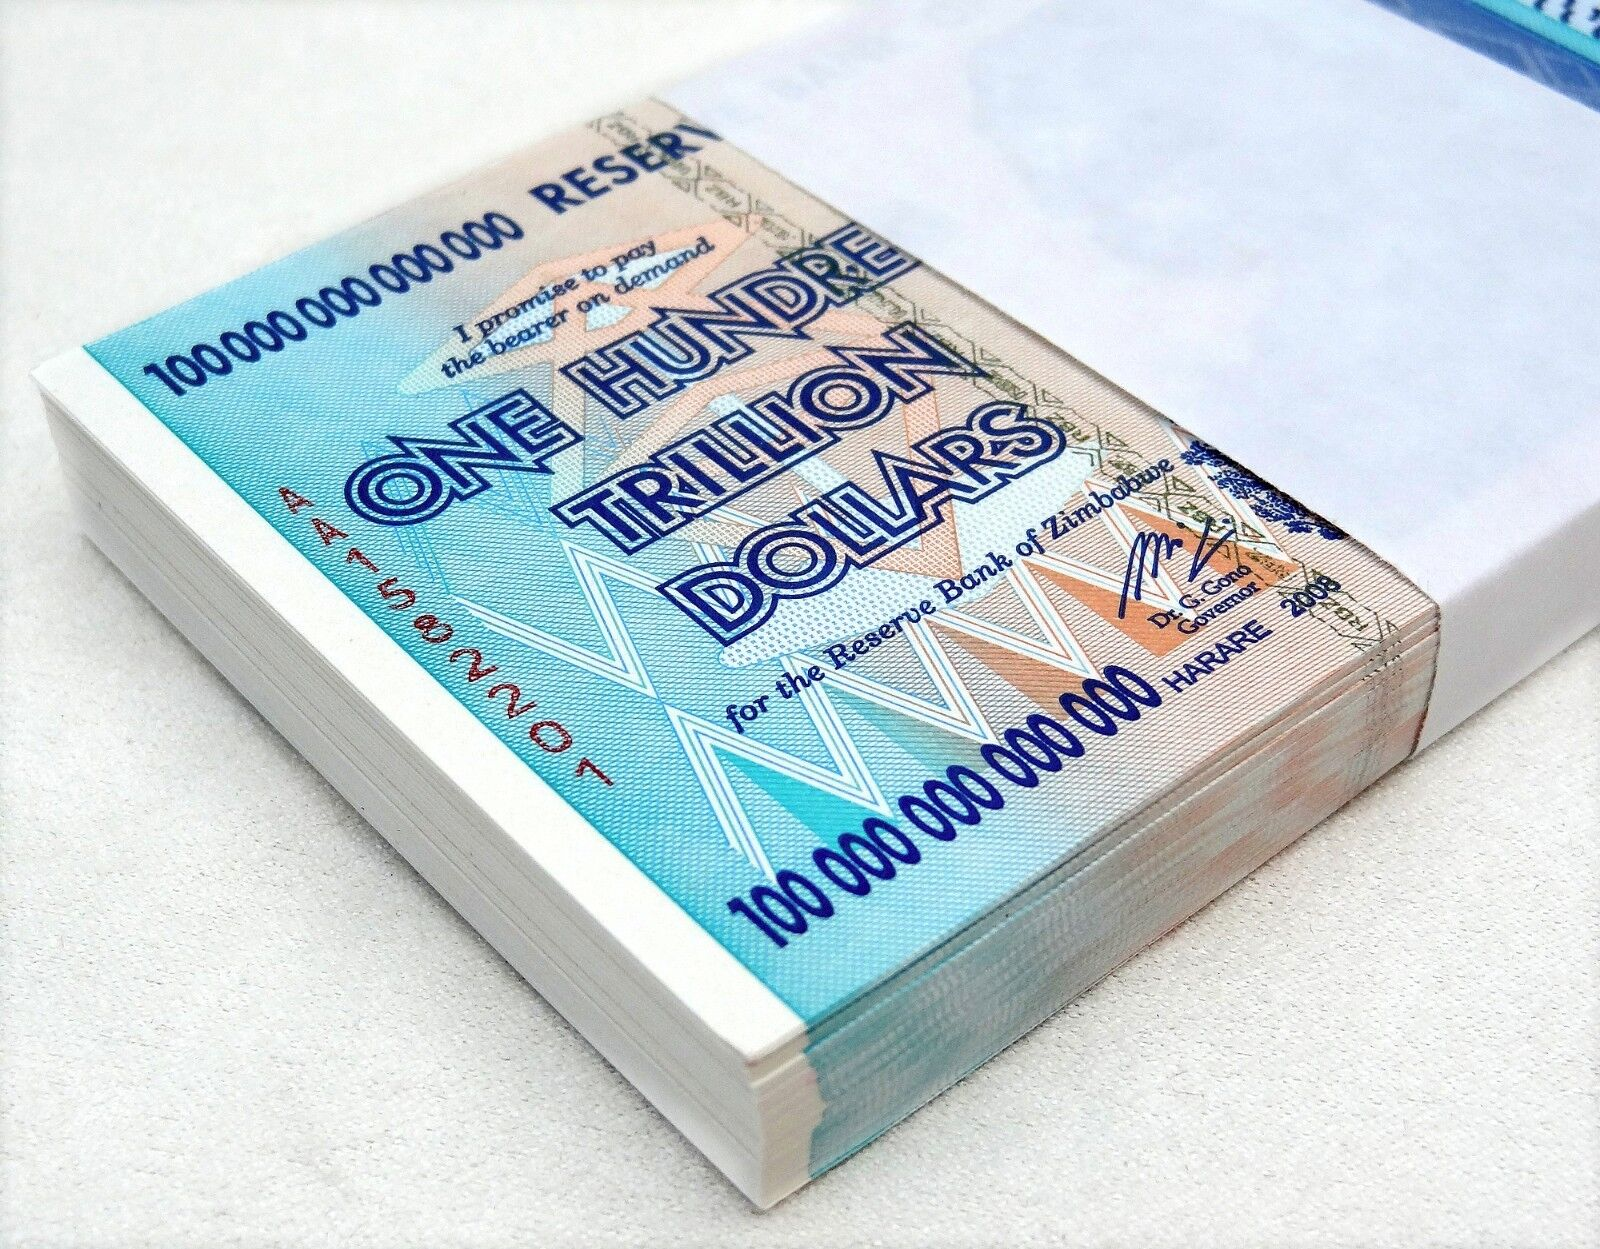 ZIMBABWE 100 TRILLION DOLLARS 2008 AA SERIES P91 UNC 500 NOTES HALF BRICK W/ COA